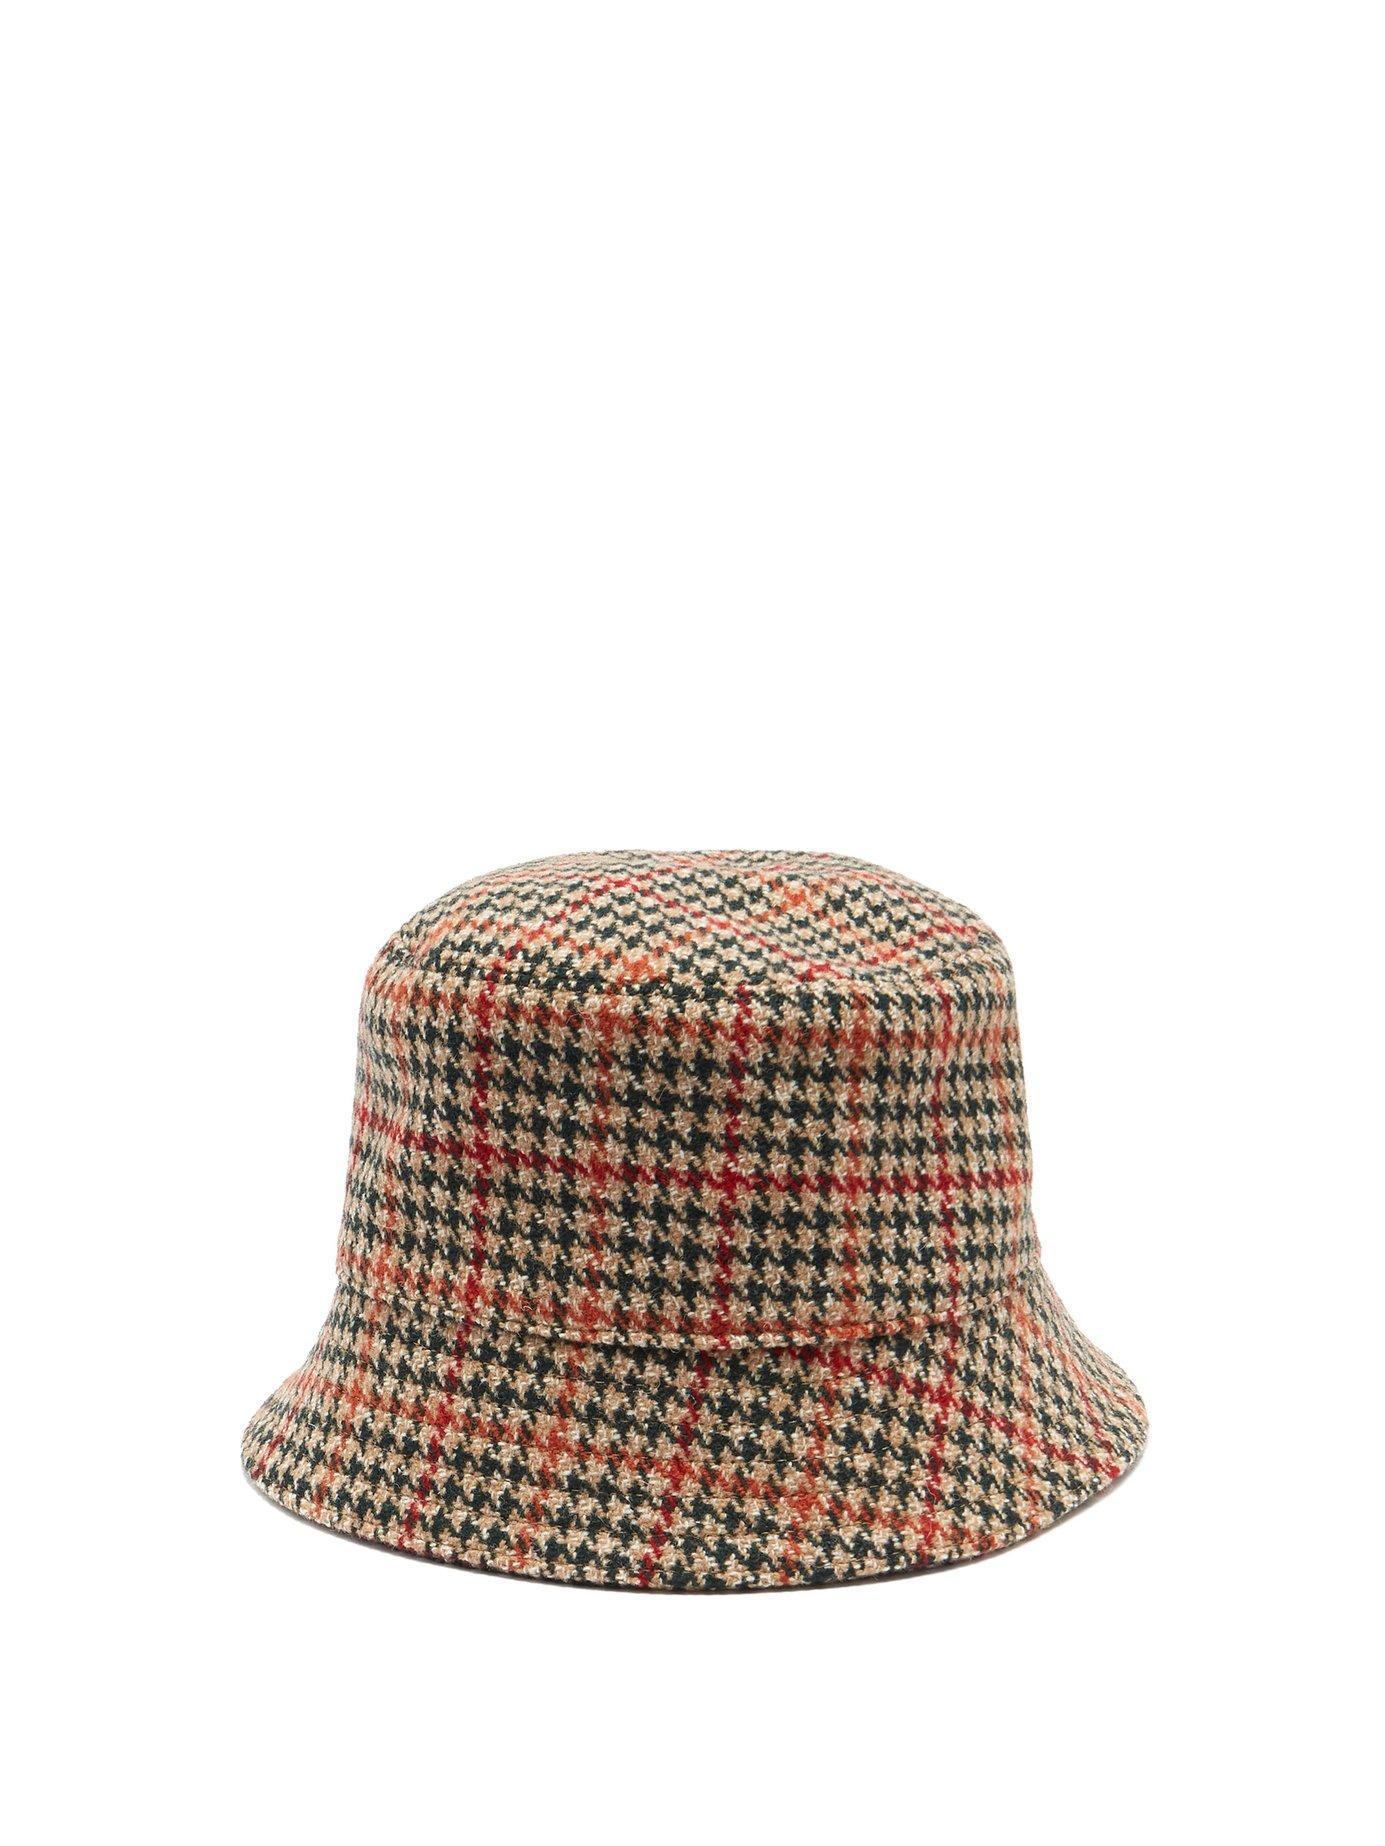 04a220fe705 Prada. Women s Houndstooth Wool Tweed Bucket Hat